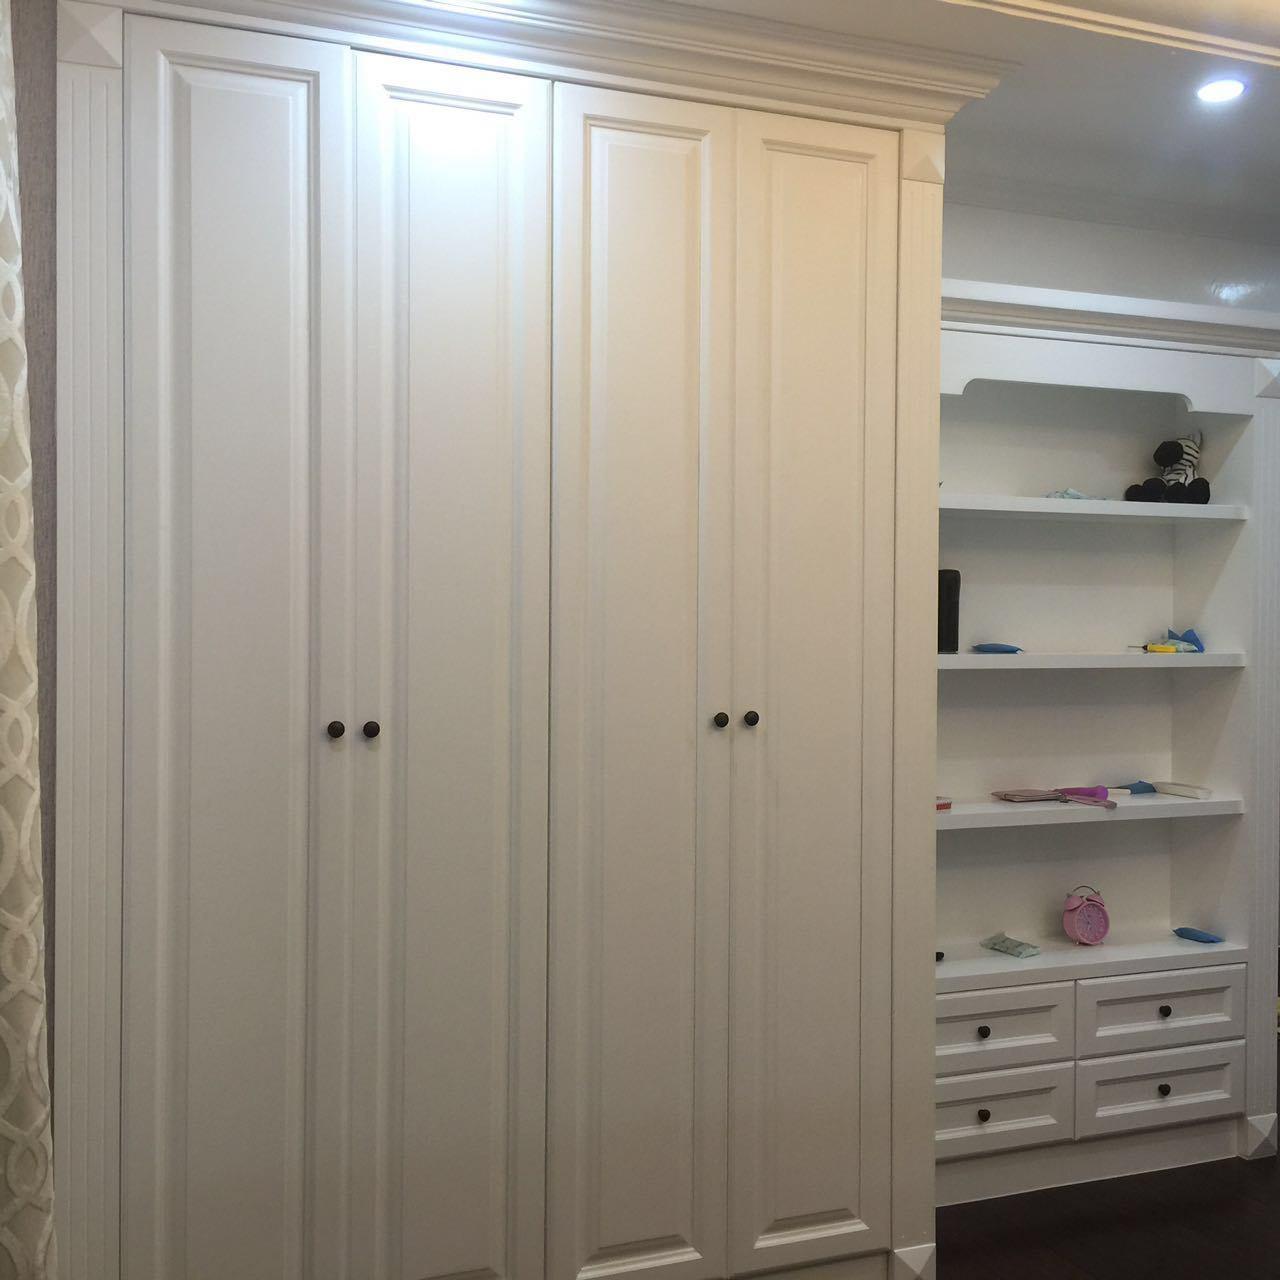 PVC Sliding Doors for Closets Wardrobes